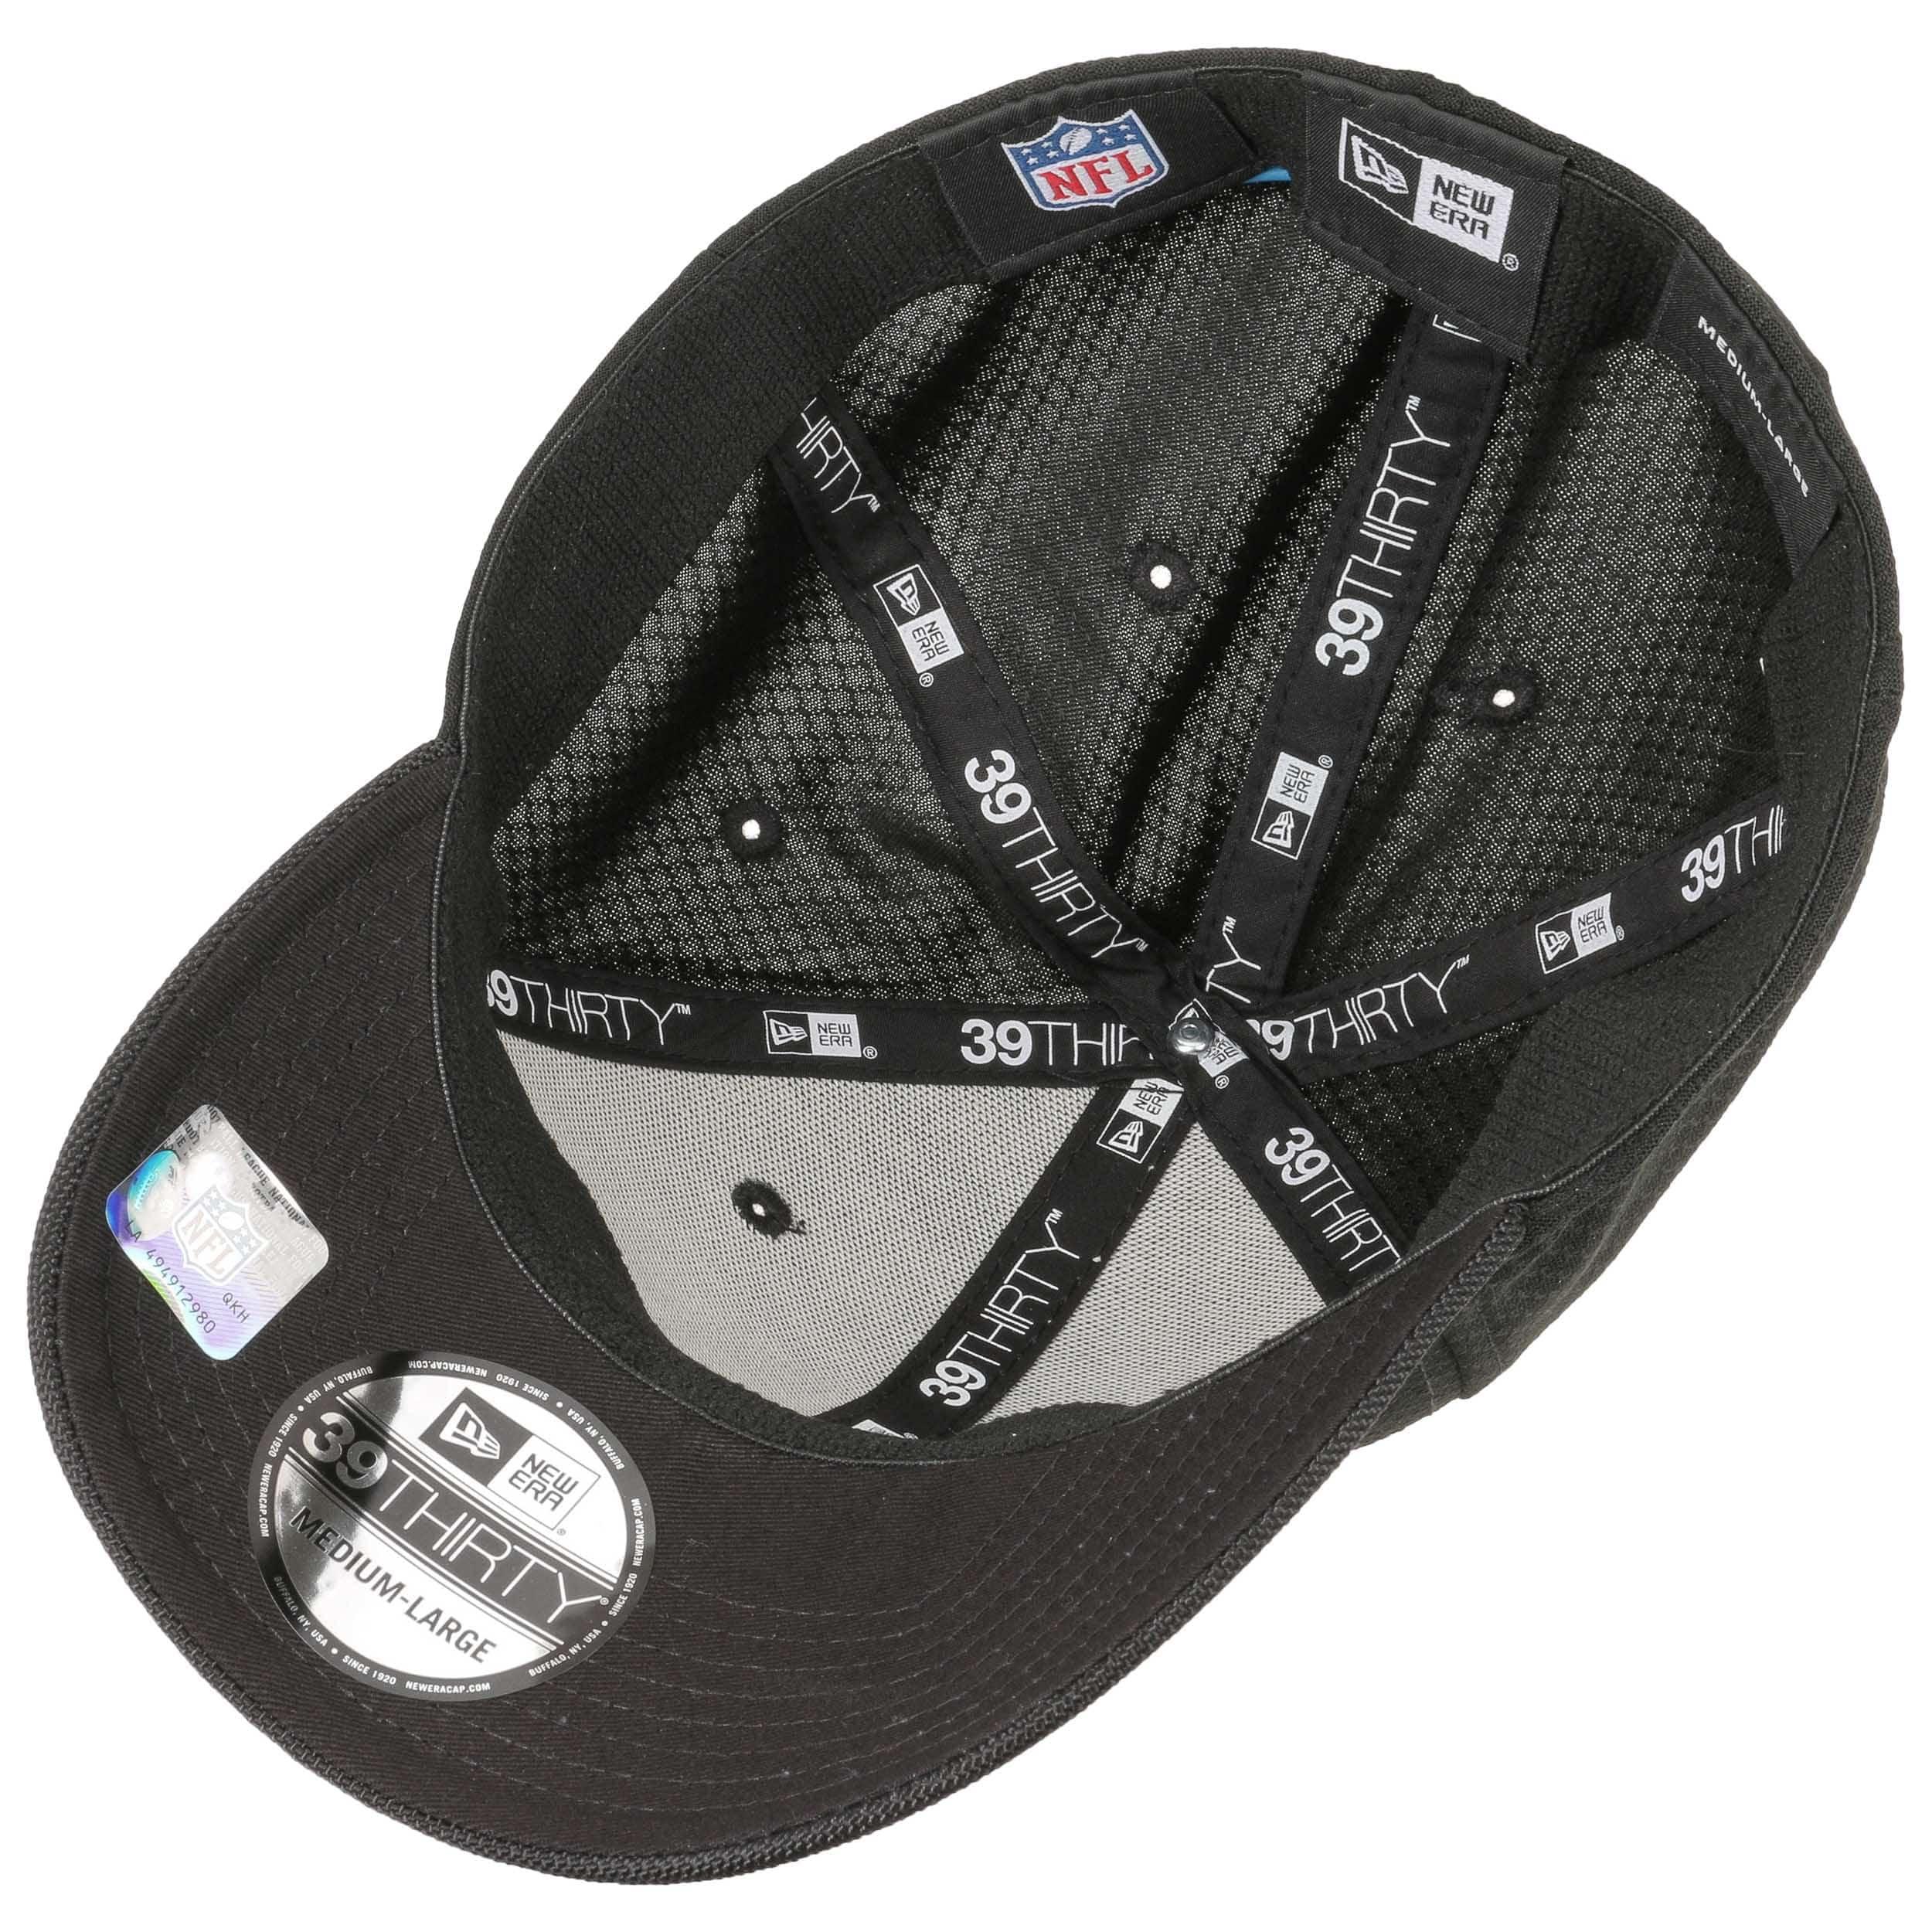 ... 39Thirty NFL Coll Patriots Cap by New Era - black 2 ... 20570385c9d